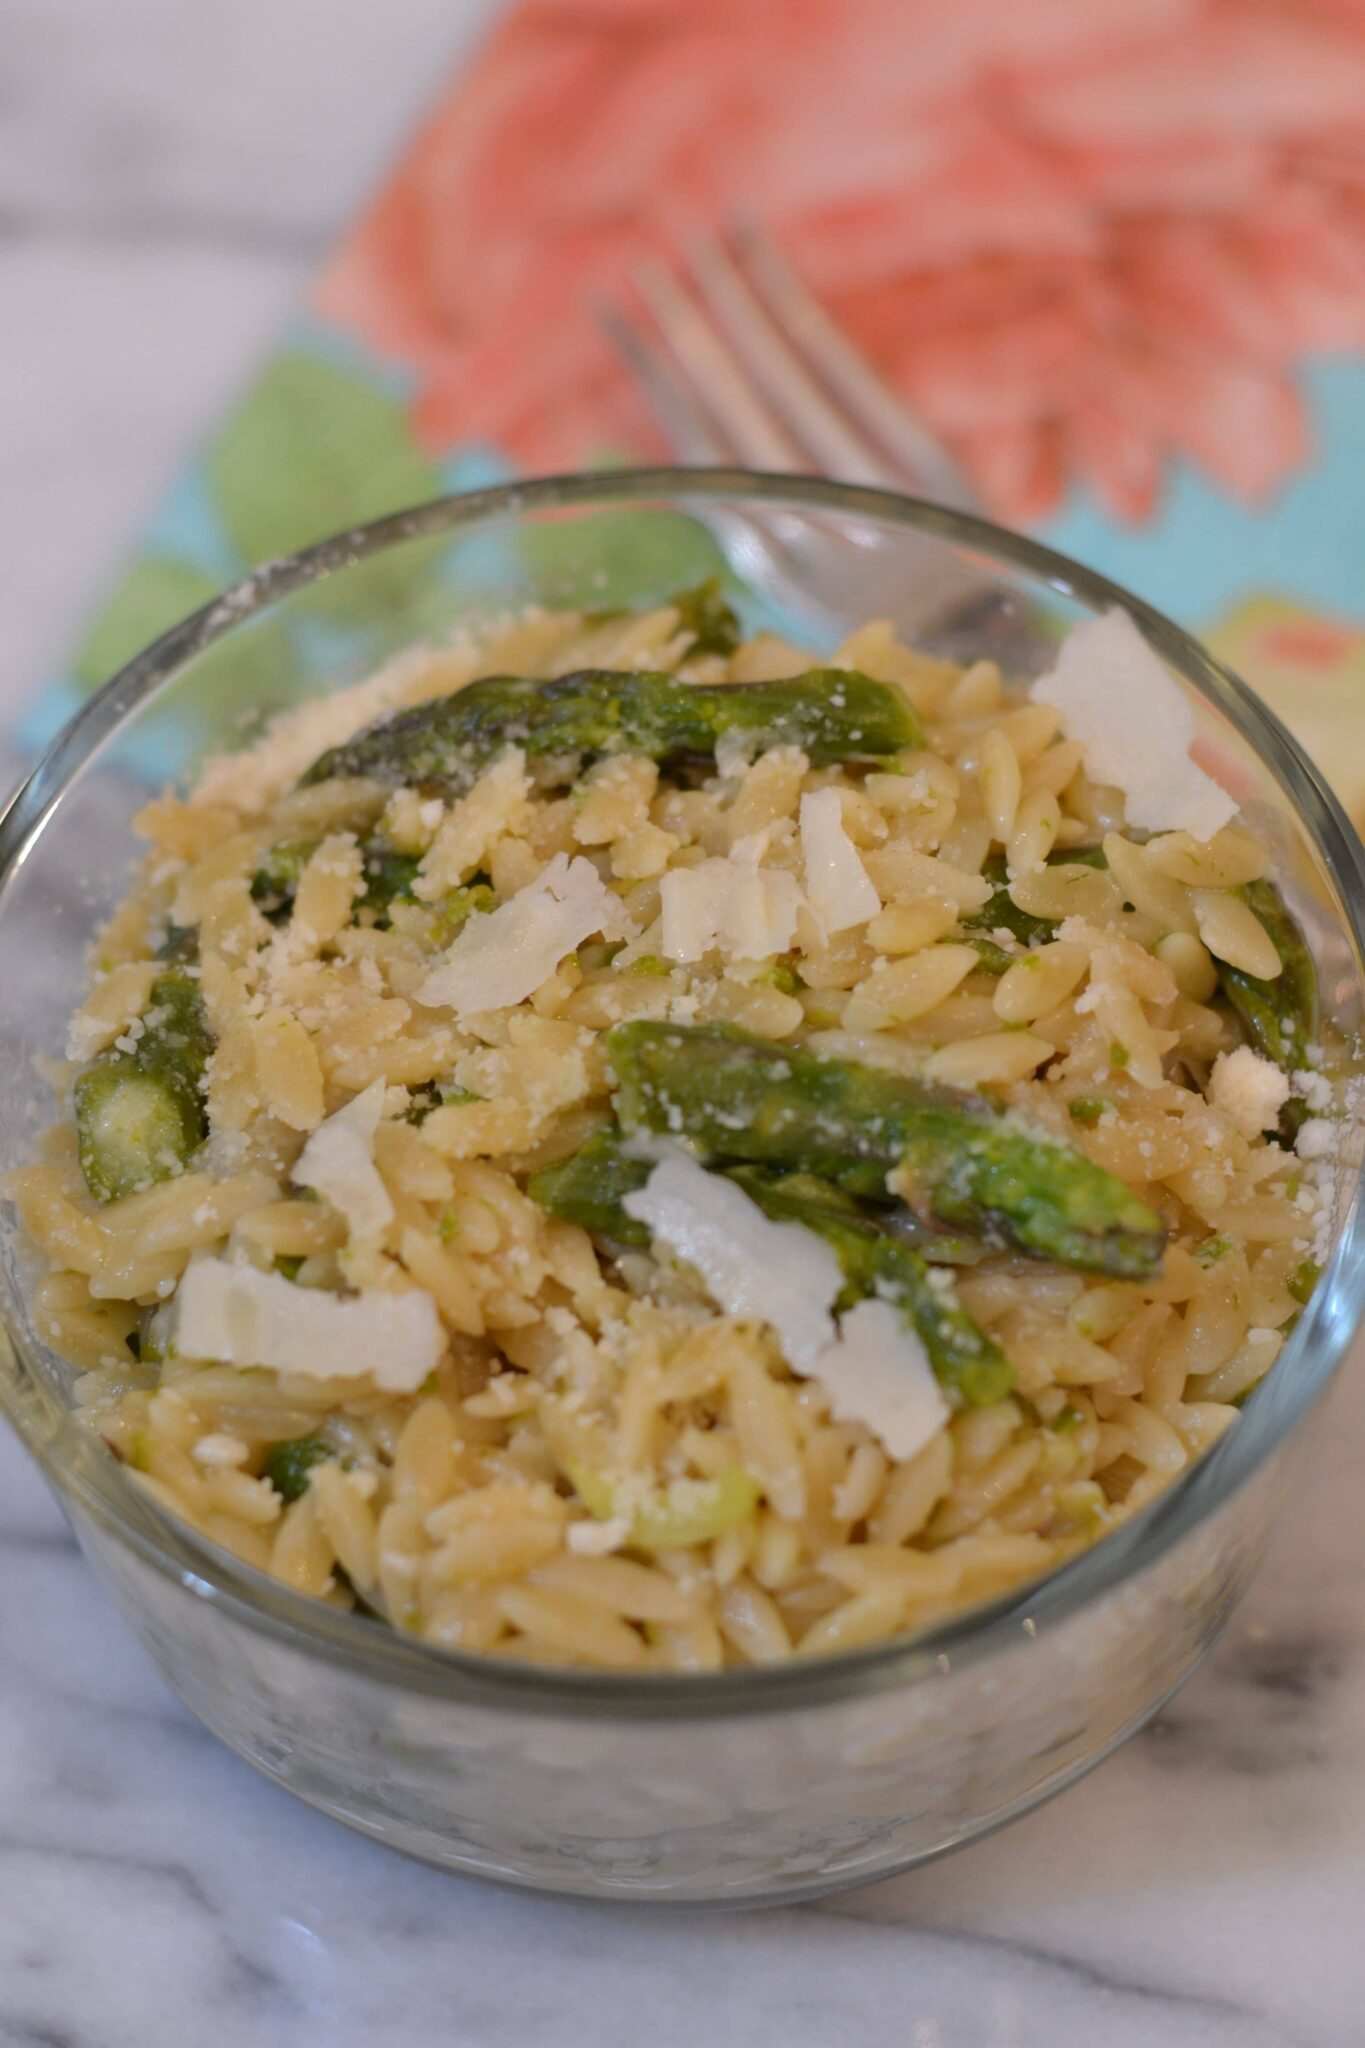 Instant Pot Garlic Parmesan Orzo With Asparagus